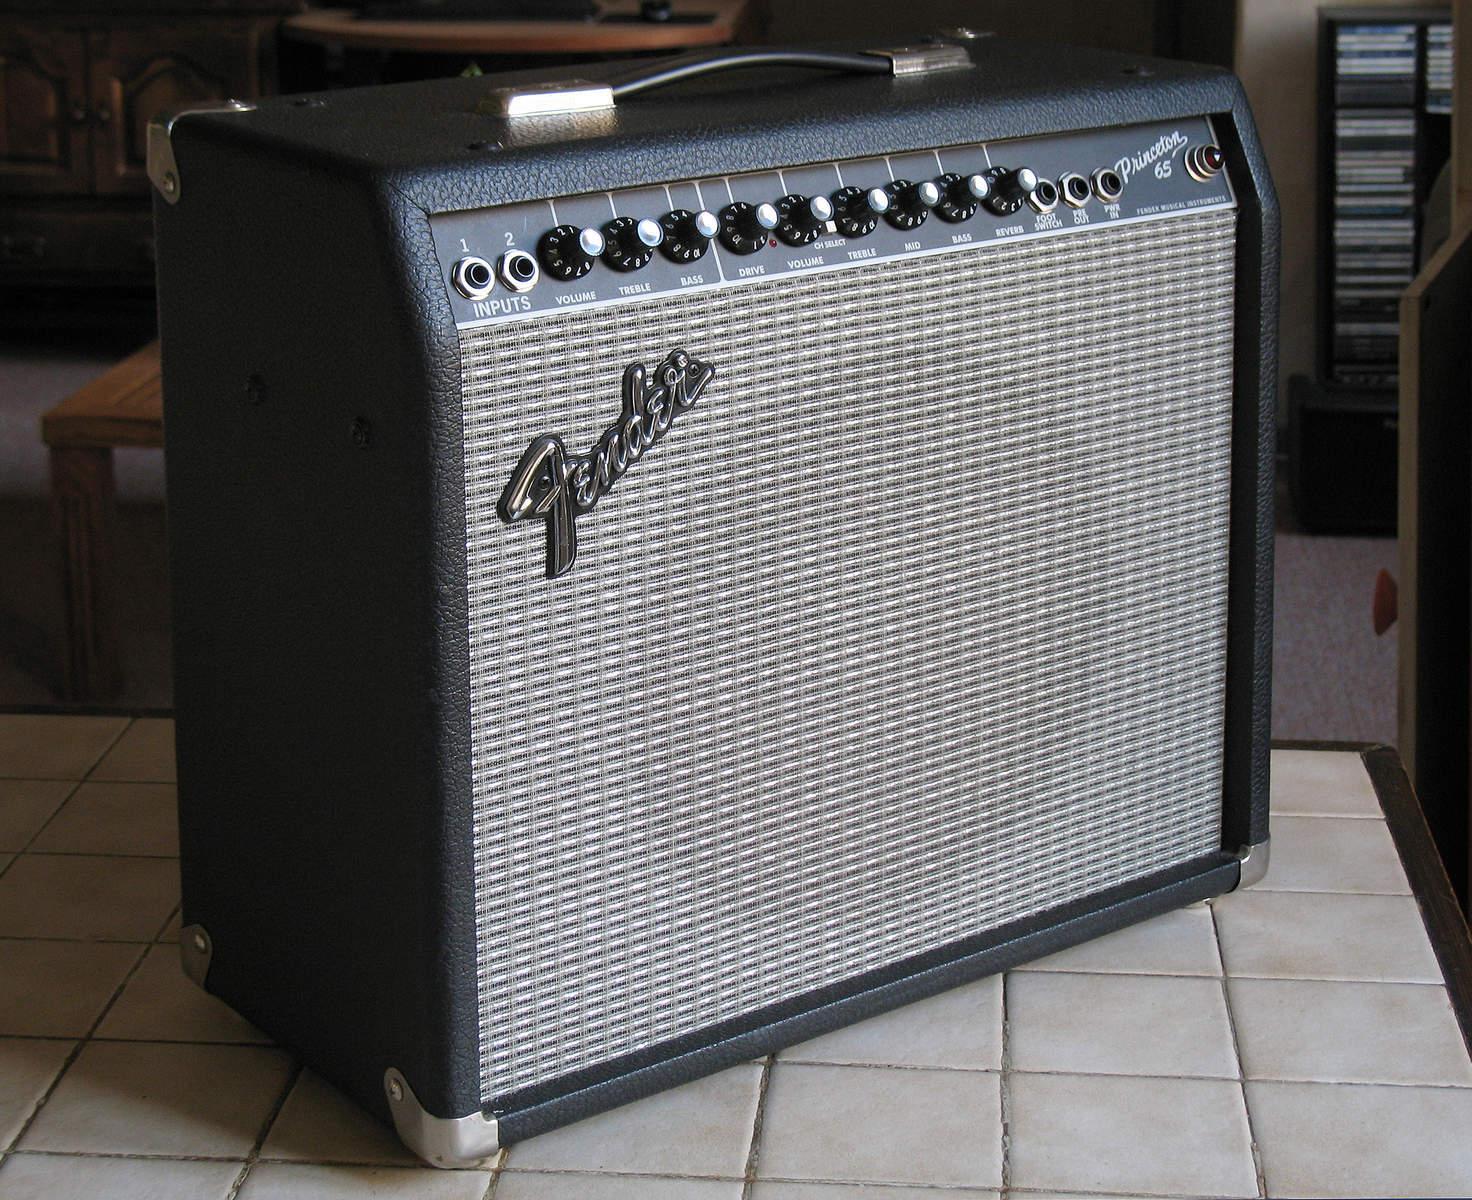 fender princeton 65 image 155505 audiofanzine rh en audiofanzine com Amp Fender Princeton DSP fender princeton 65 dsp manual download